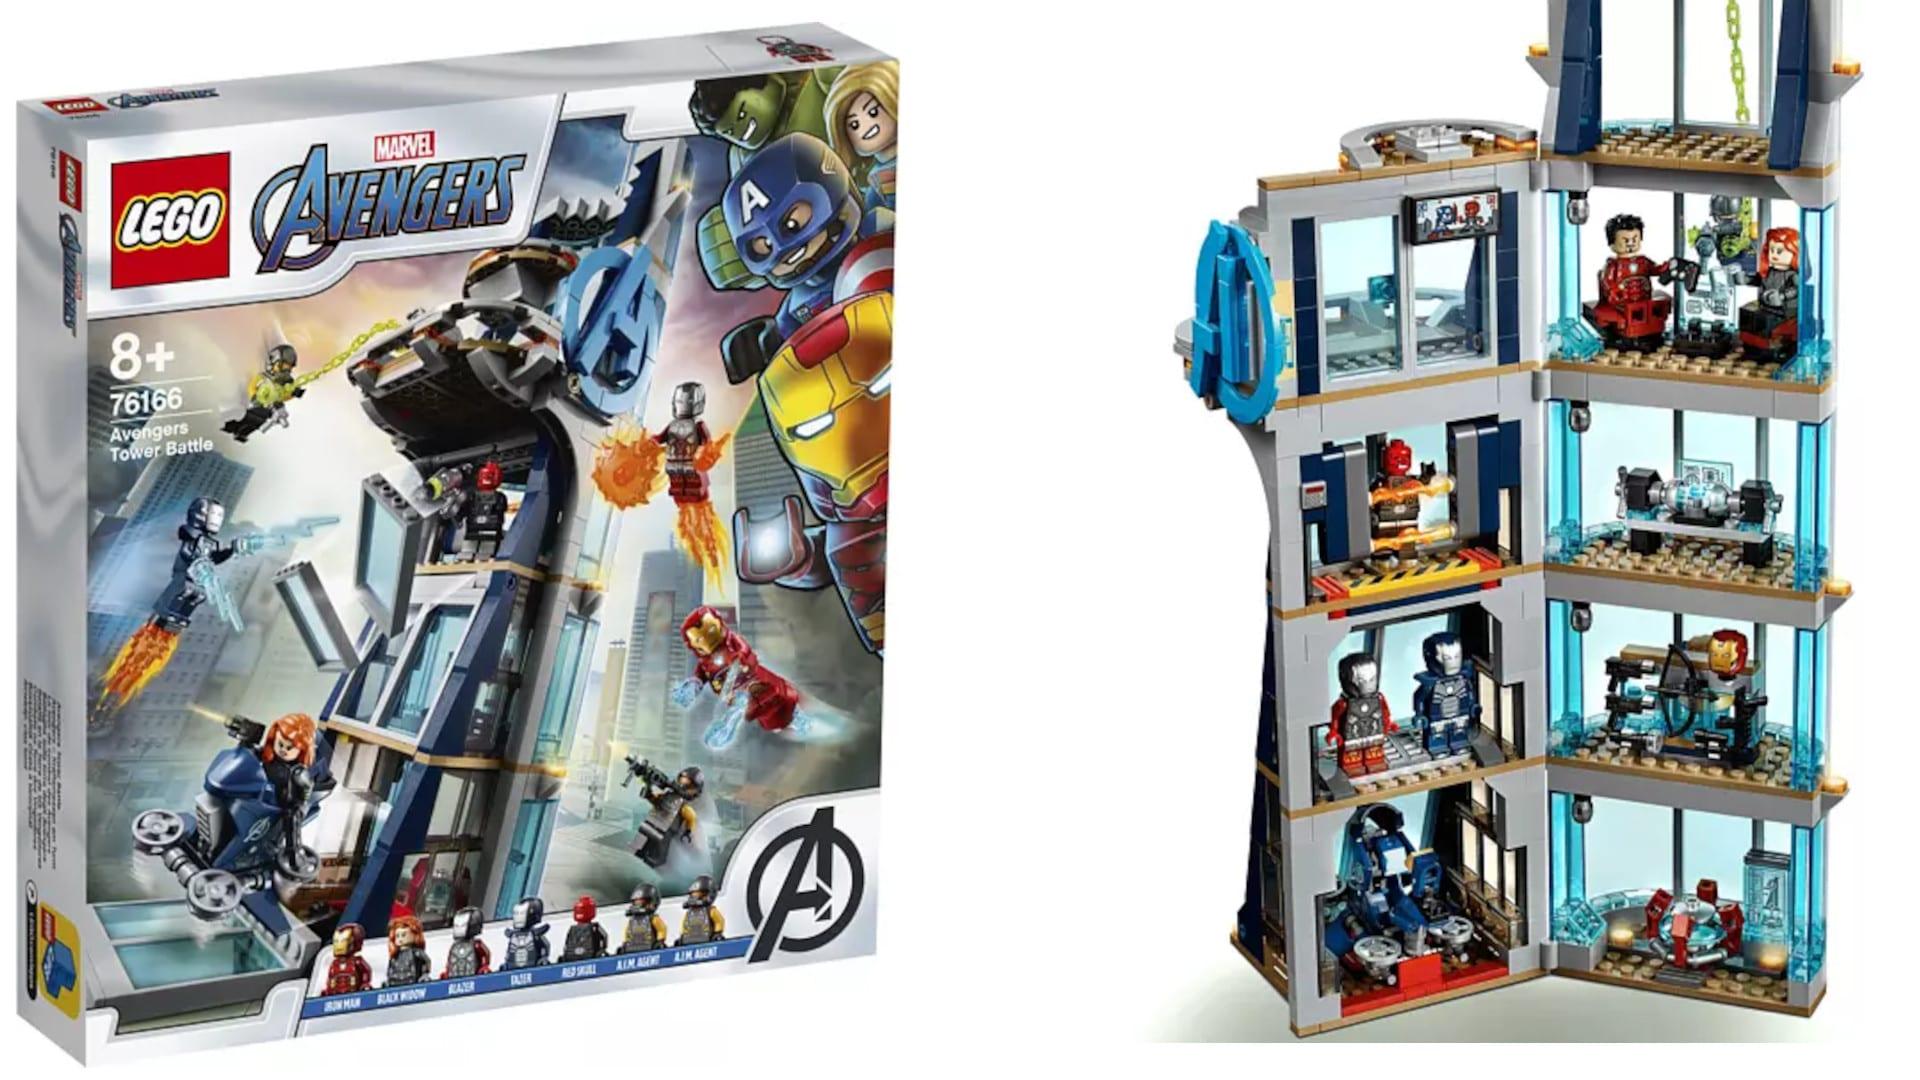 LEGO Avengers Kräftemessen am Turm